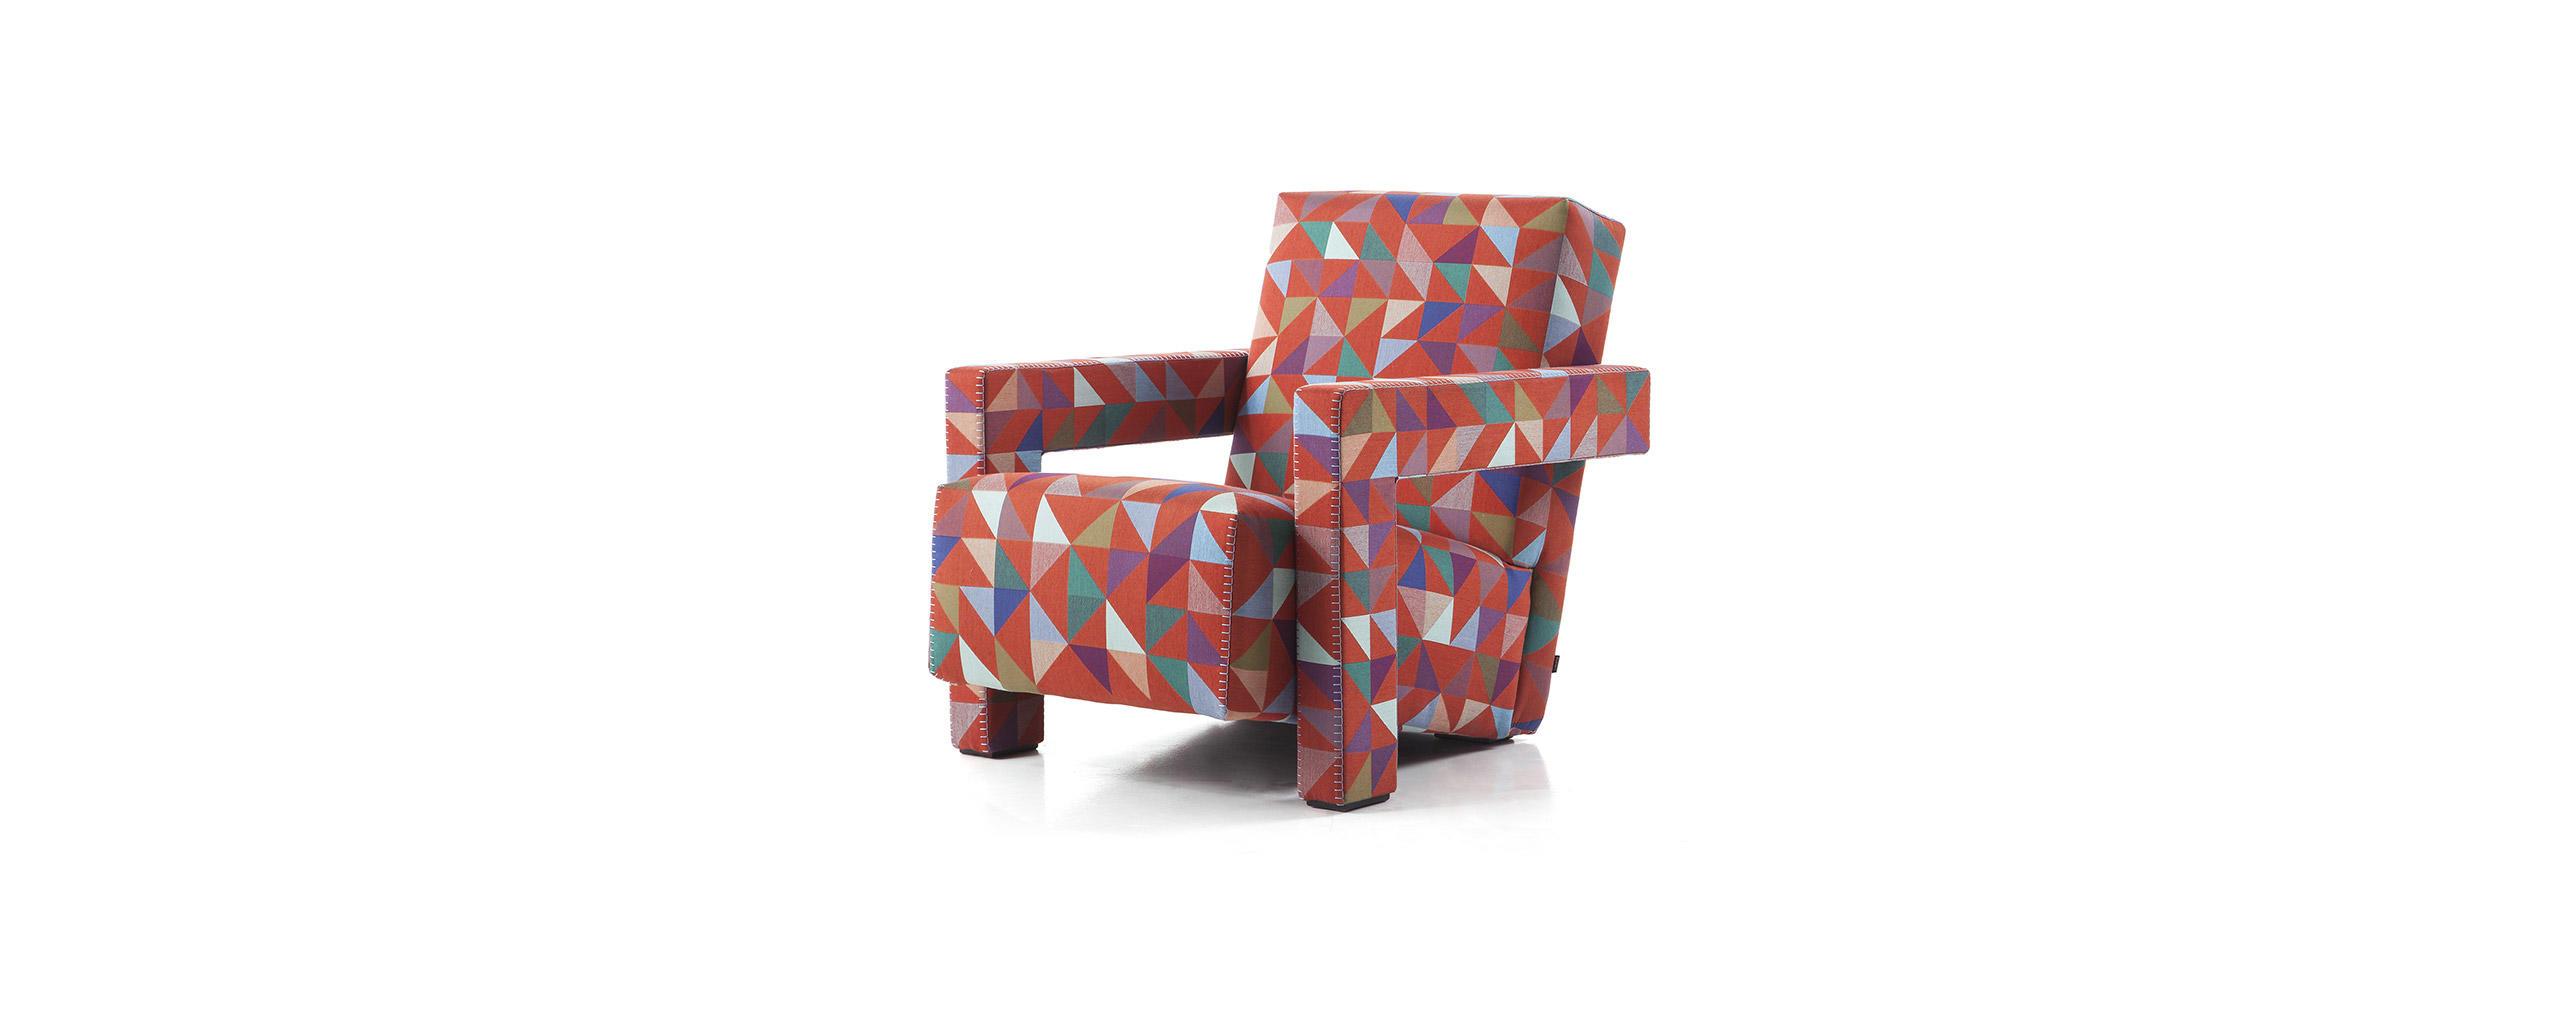 4_cassina_utrecht_collectors_edition_bertjan_pot_boxblocks_fabric_red